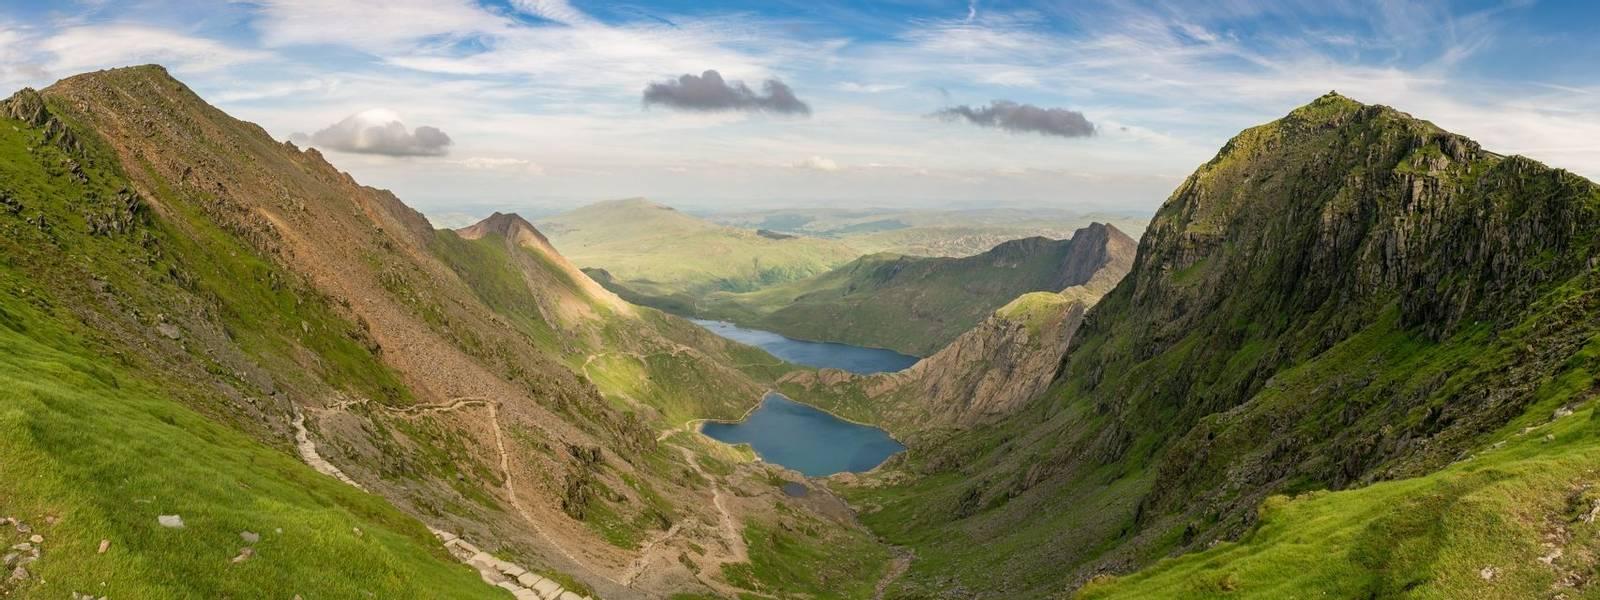 UK 3 Peaks - Guided Trail - Llanberis Path Snowdonia - AdobeStock_185866155